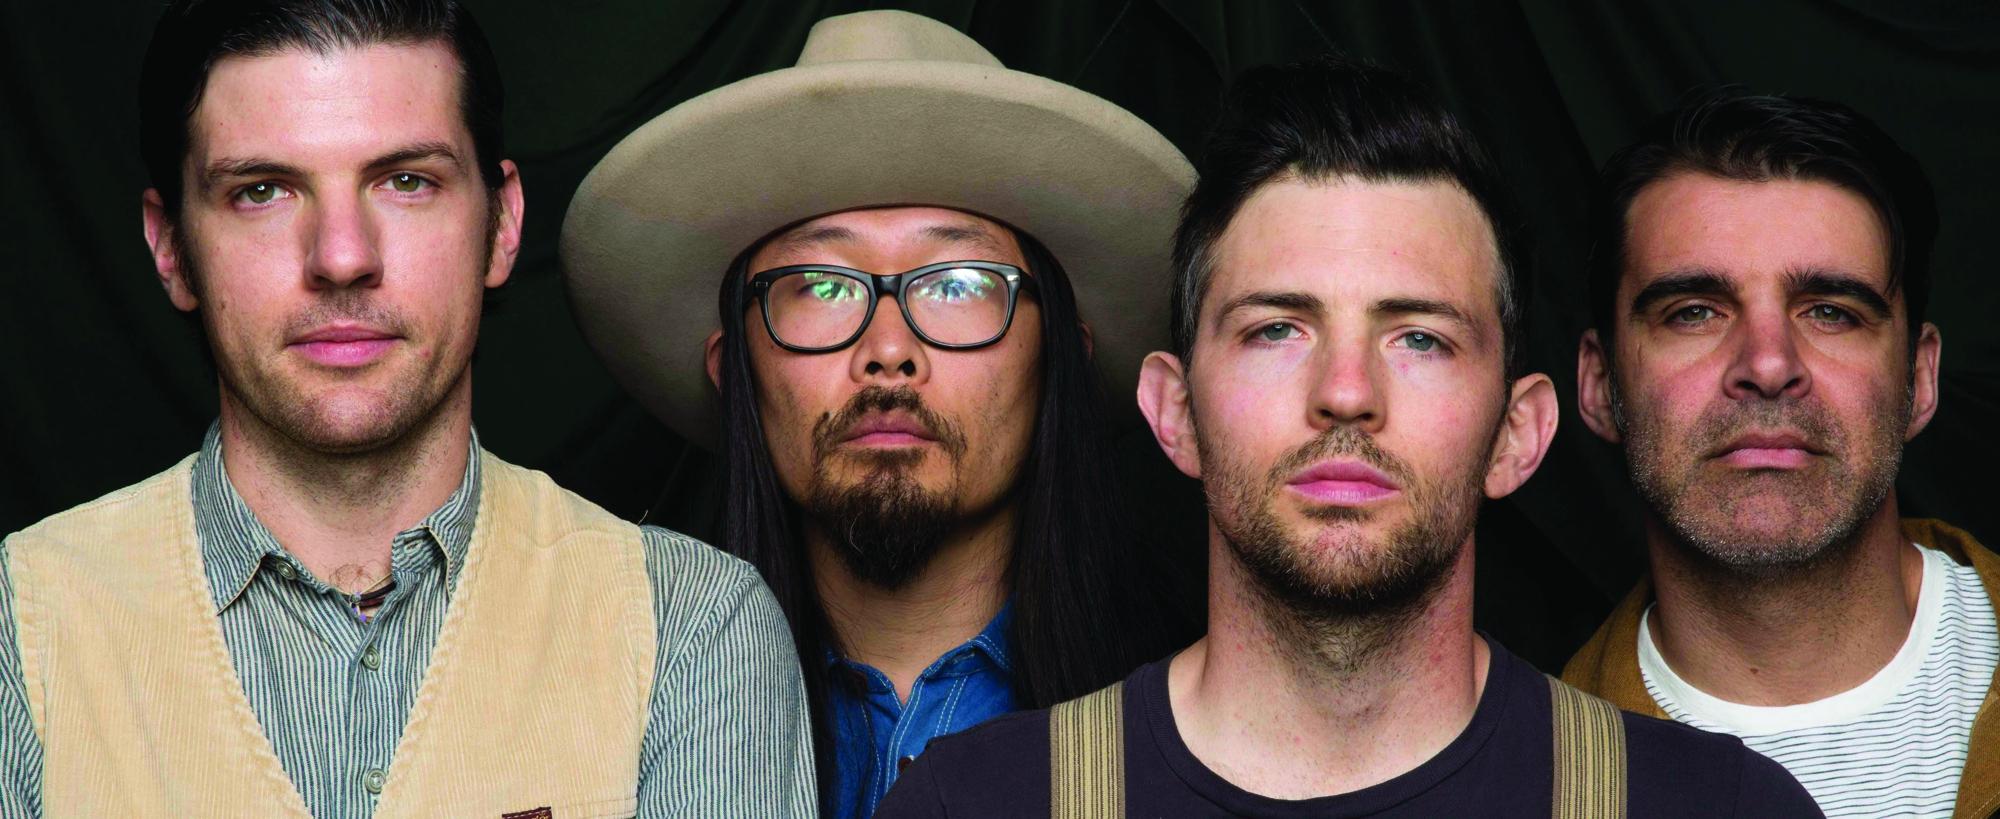 The Avett Brothers - Presented by Birmingham Mountain Radio